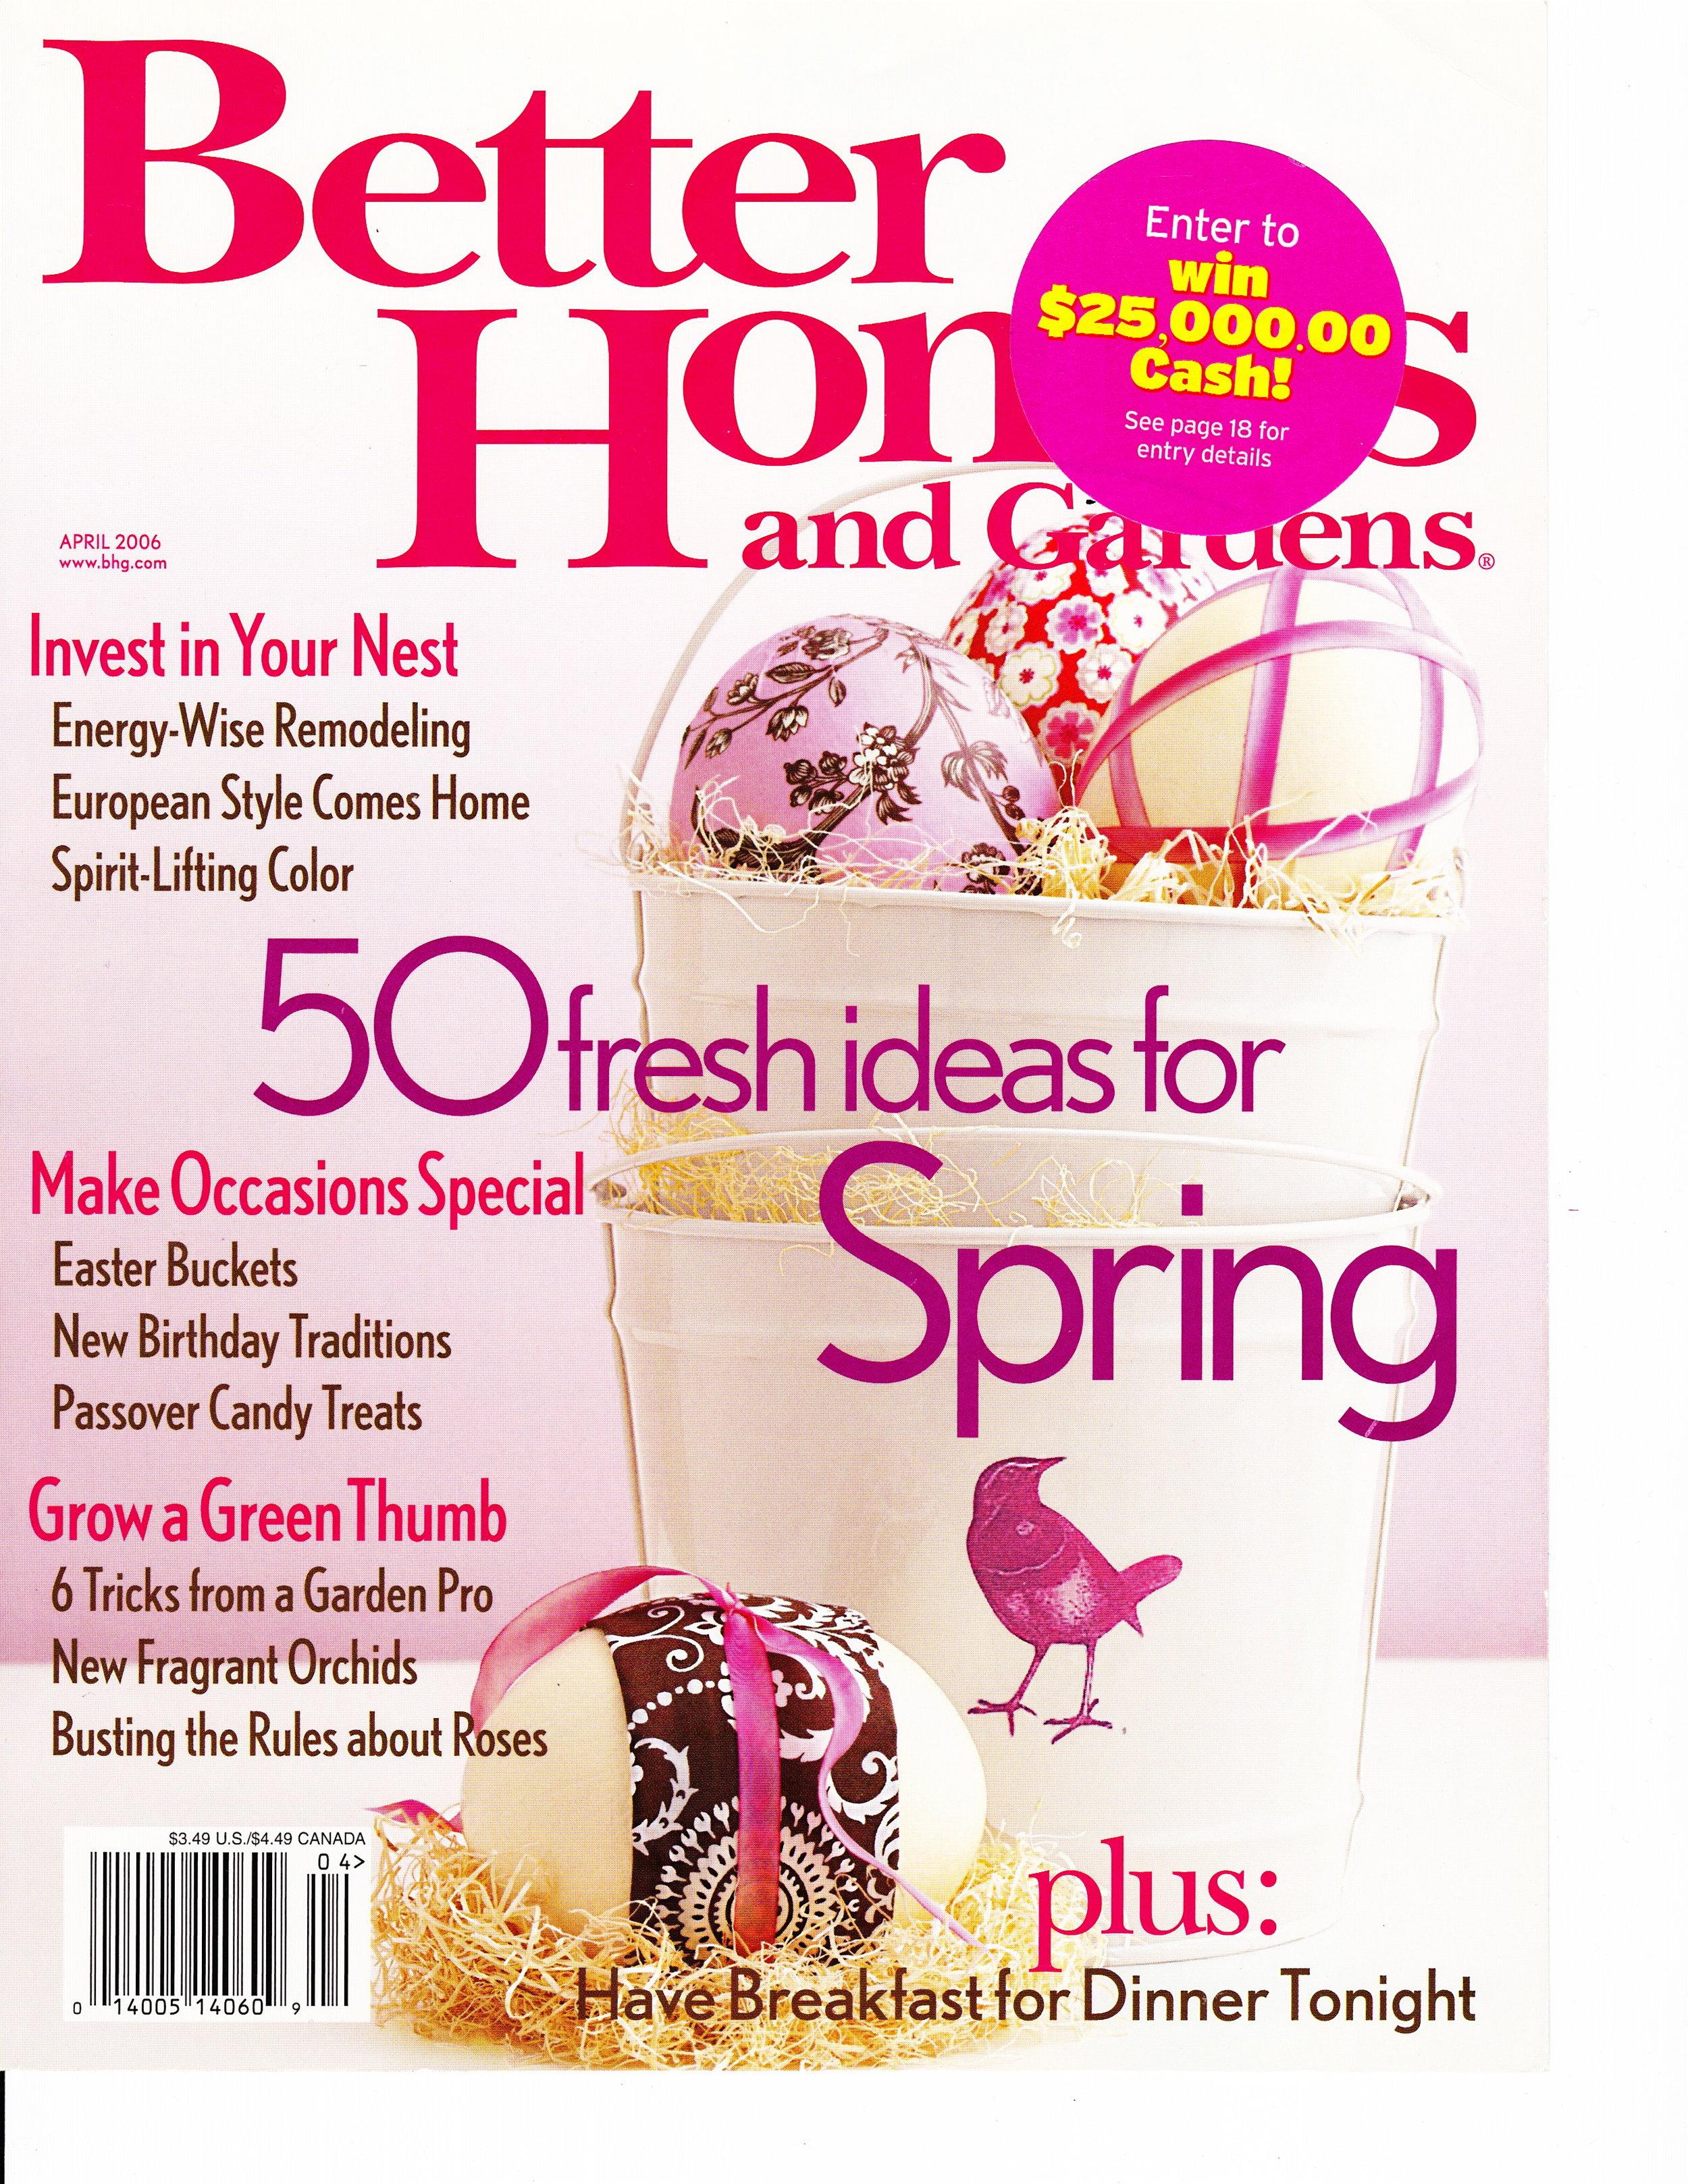 2006 April Better Homes and Gardens.jpg